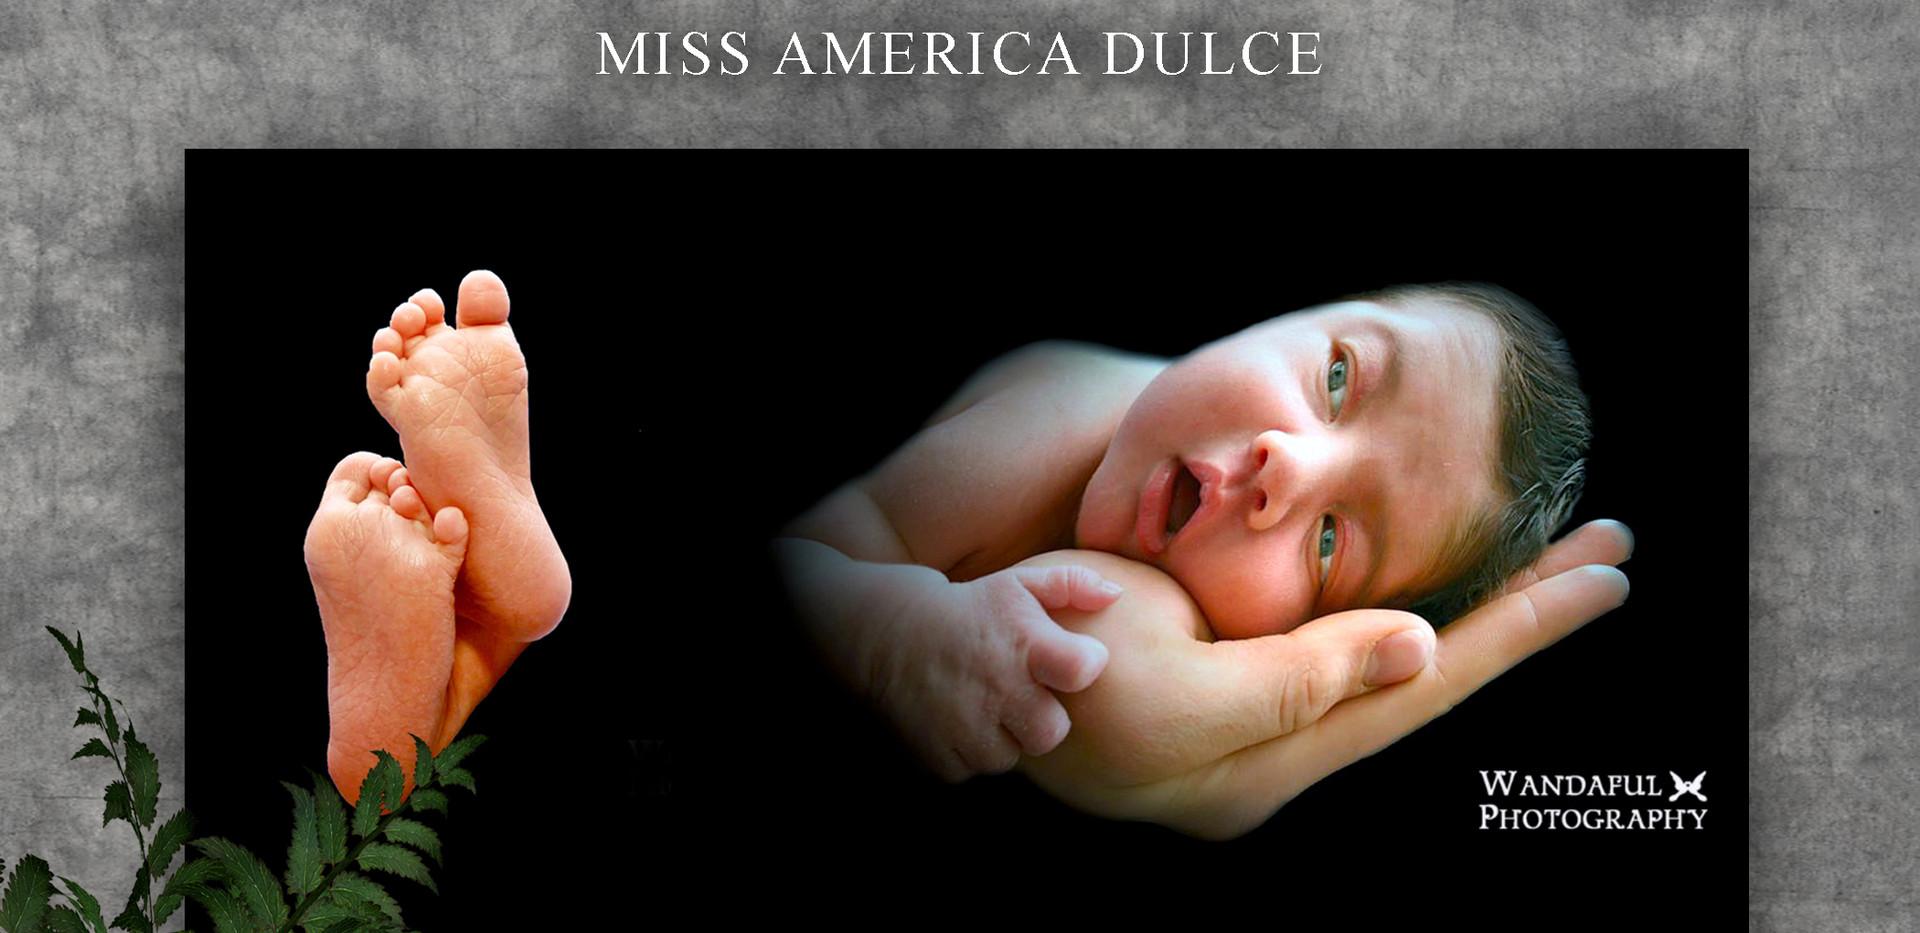 0 America Candy Dulce.jpg